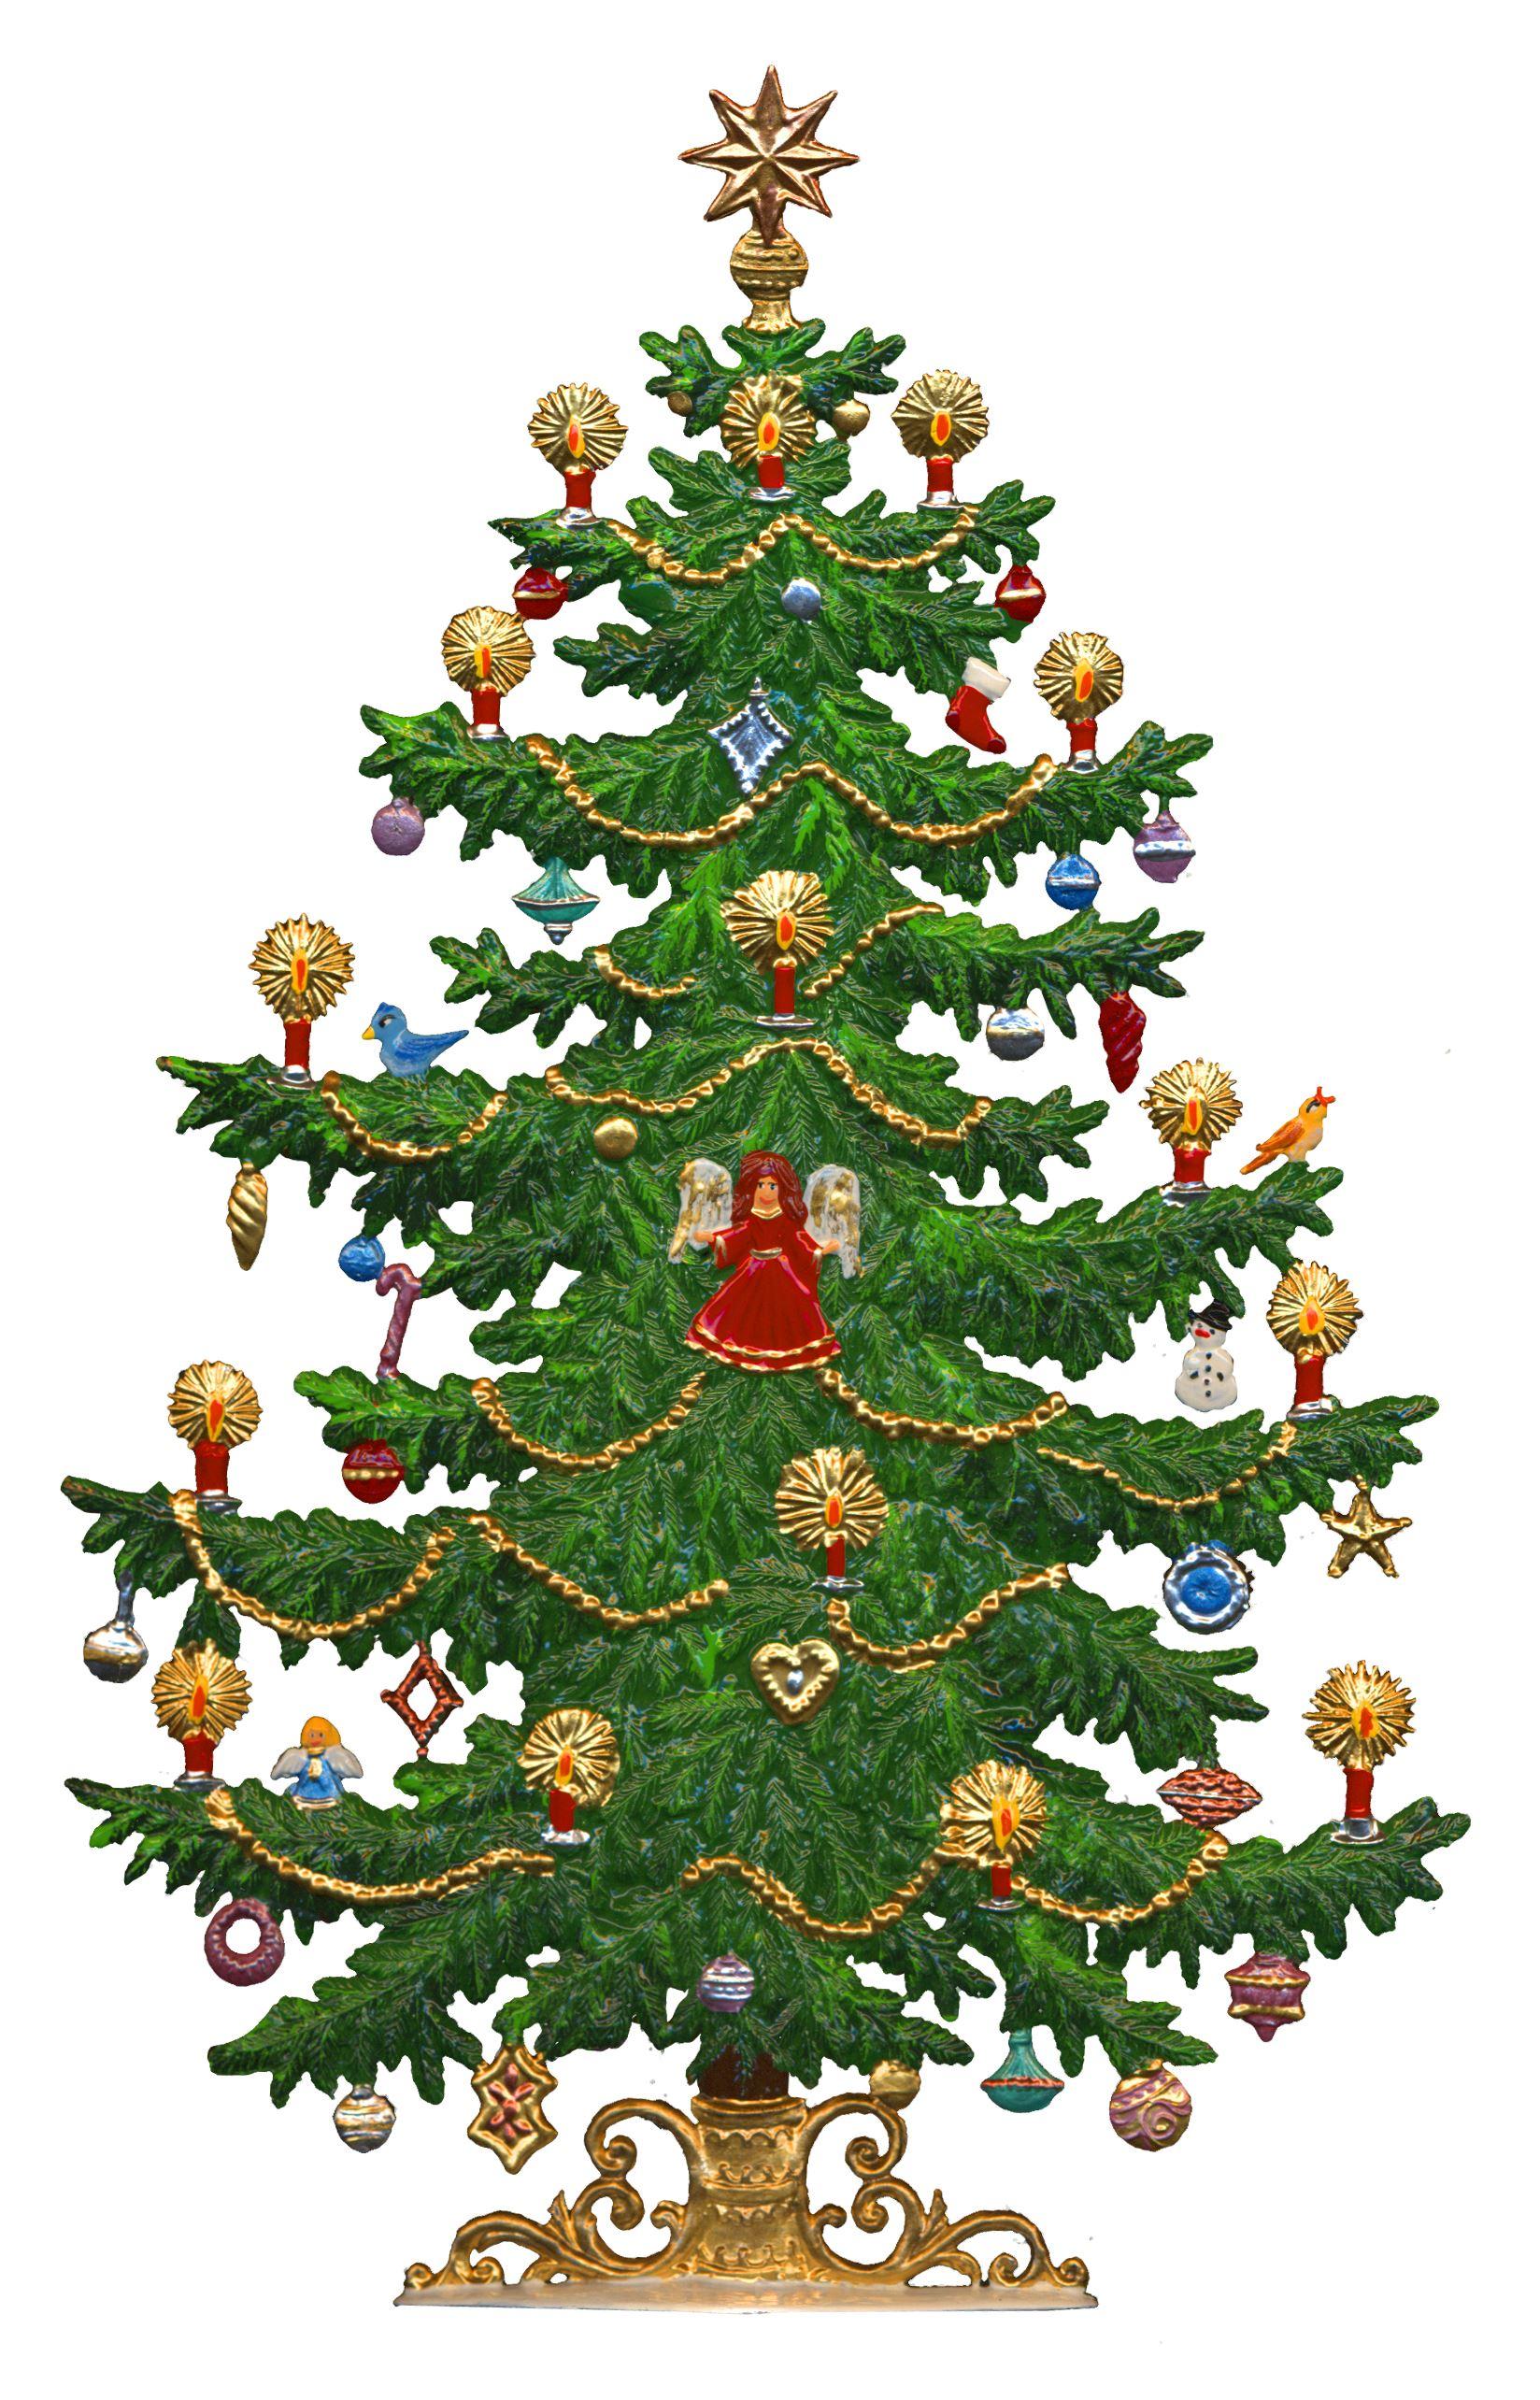 berliner zinnfiguren weihnachtsbaum geschm ckt online. Black Bedroom Furniture Sets. Home Design Ideas